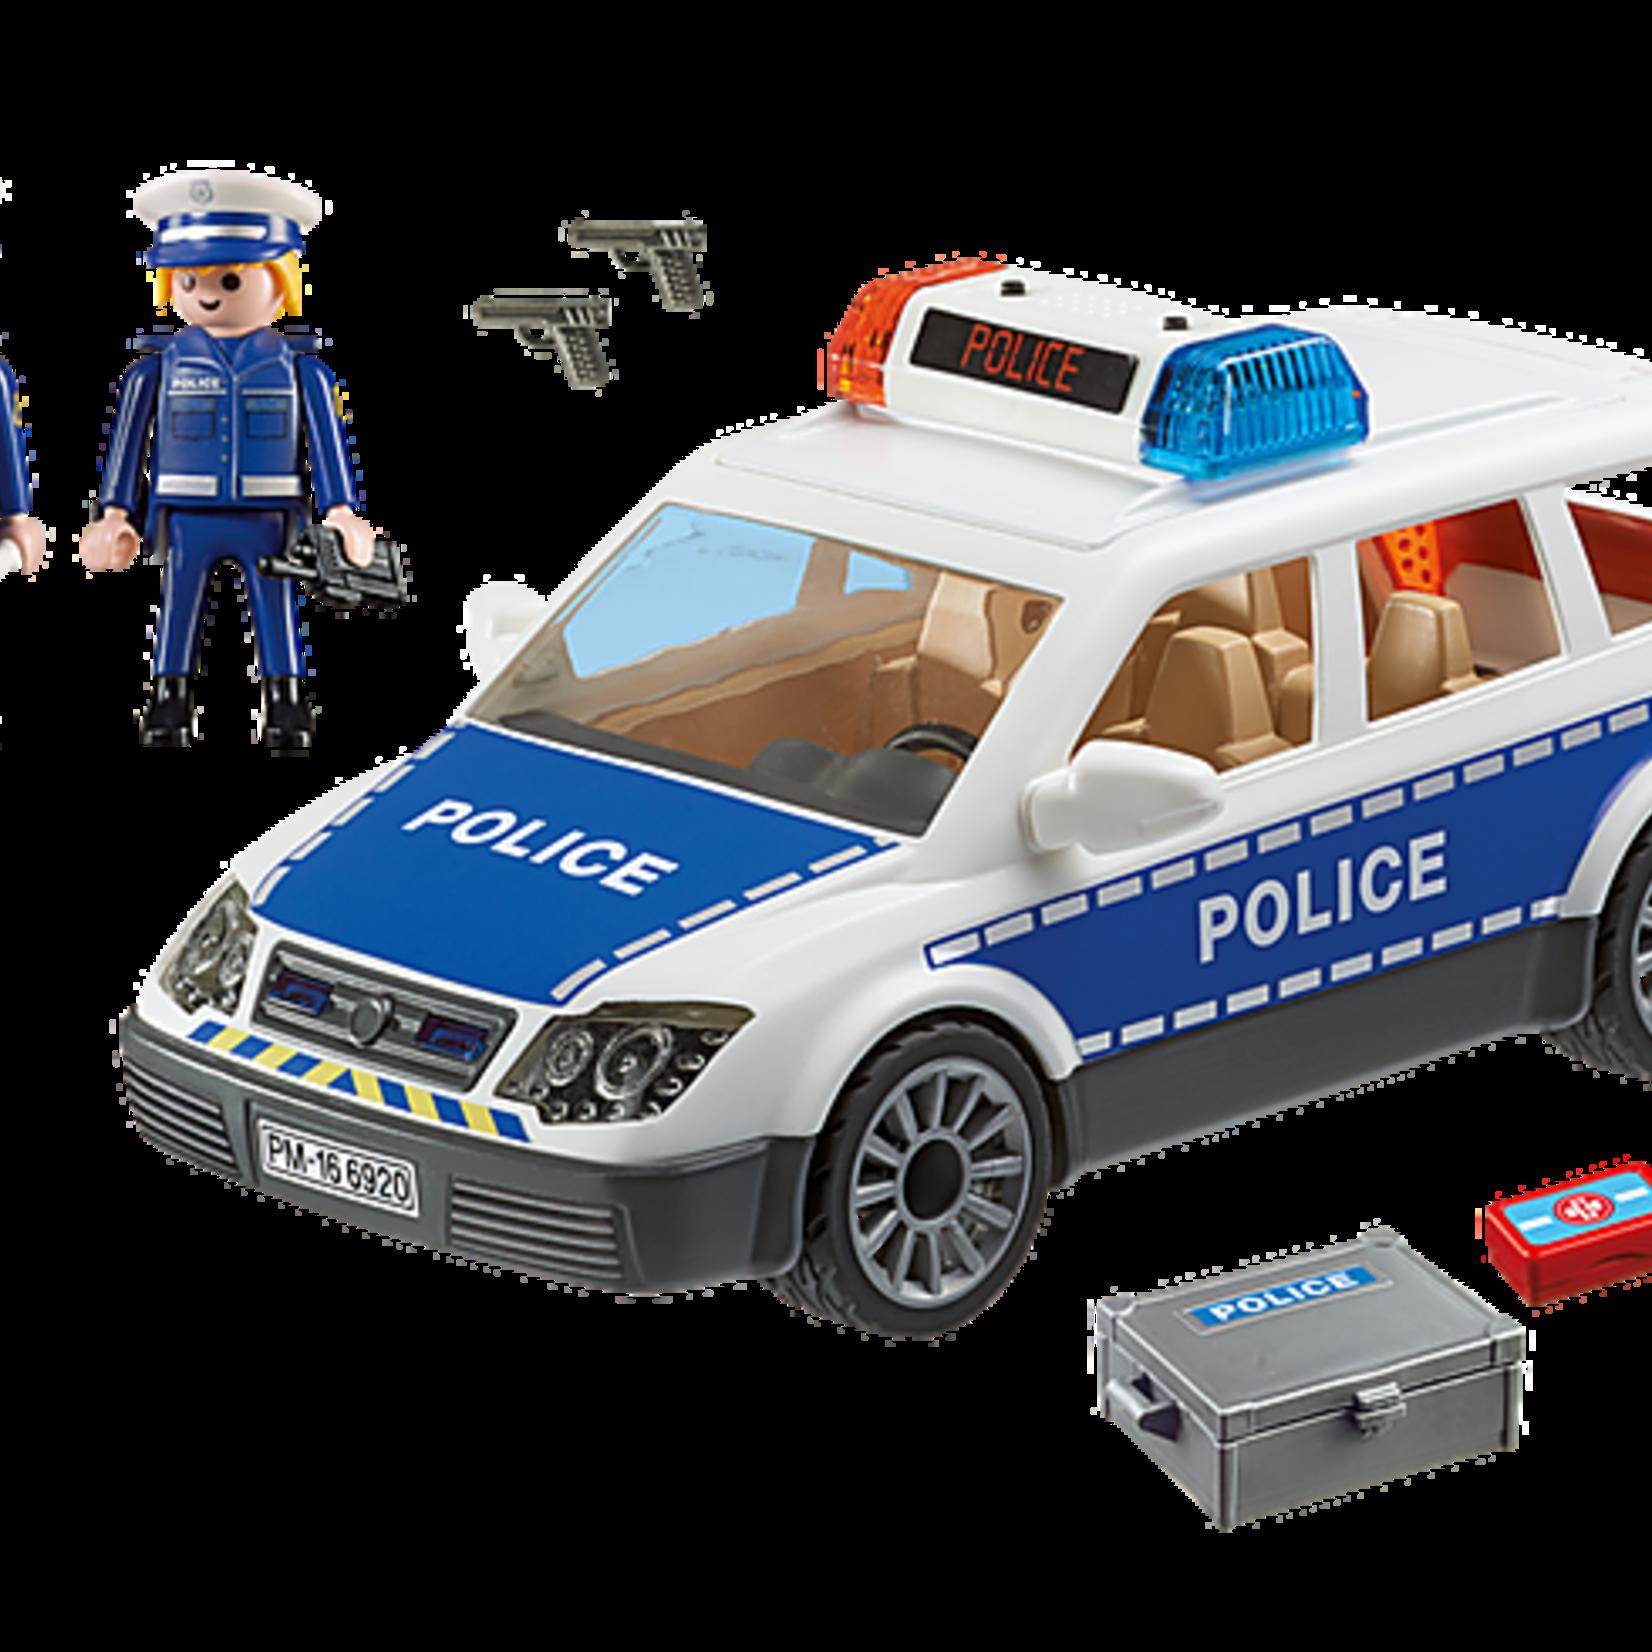 Playmobil Police Emergency Vehicle - Playmobil 6920